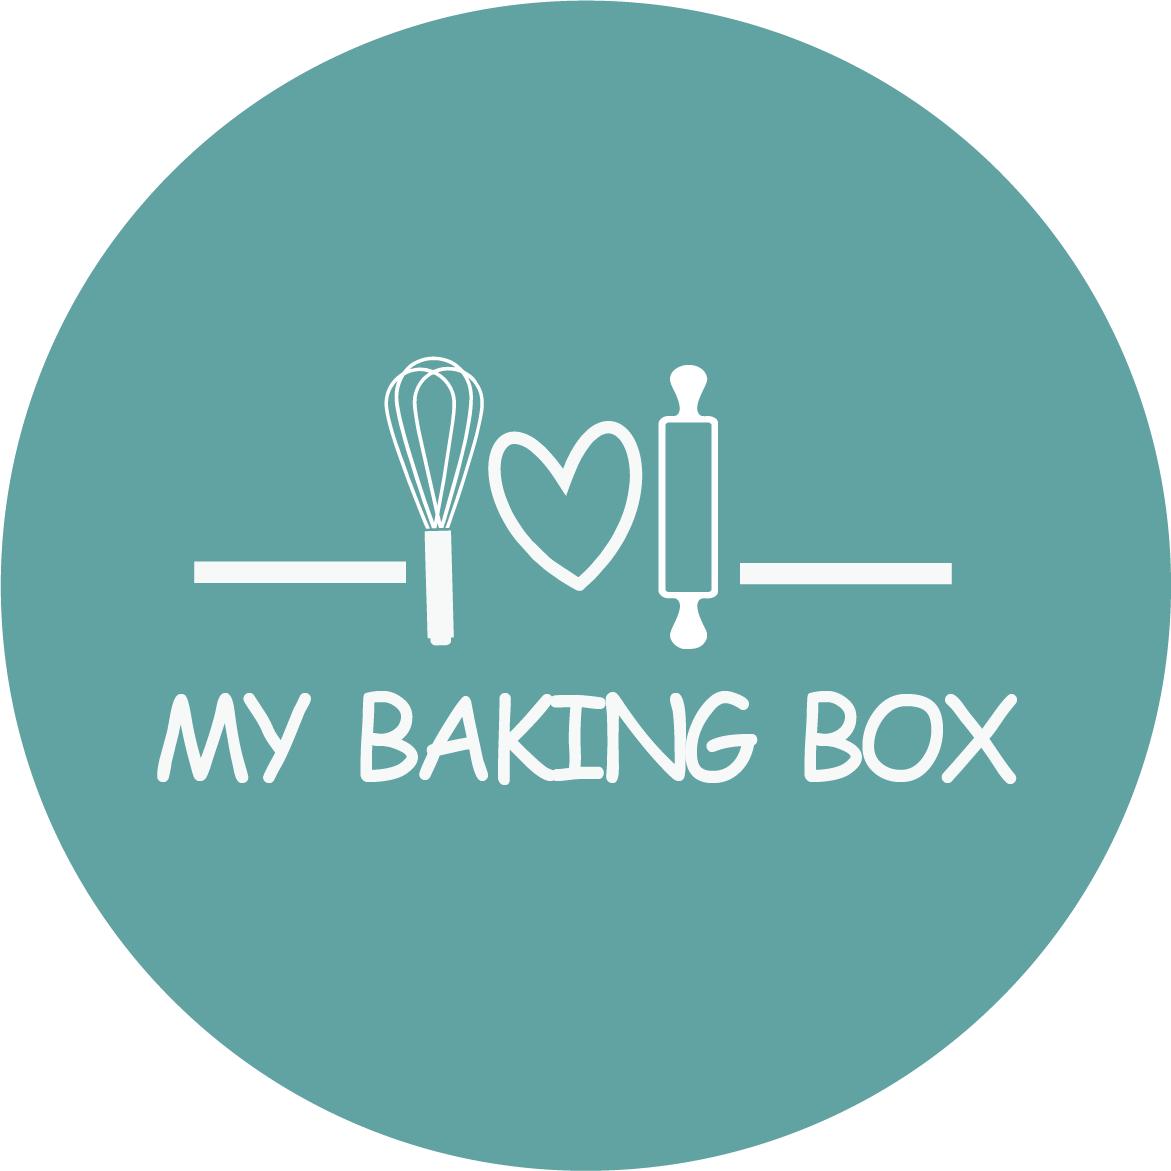 My Baking Box